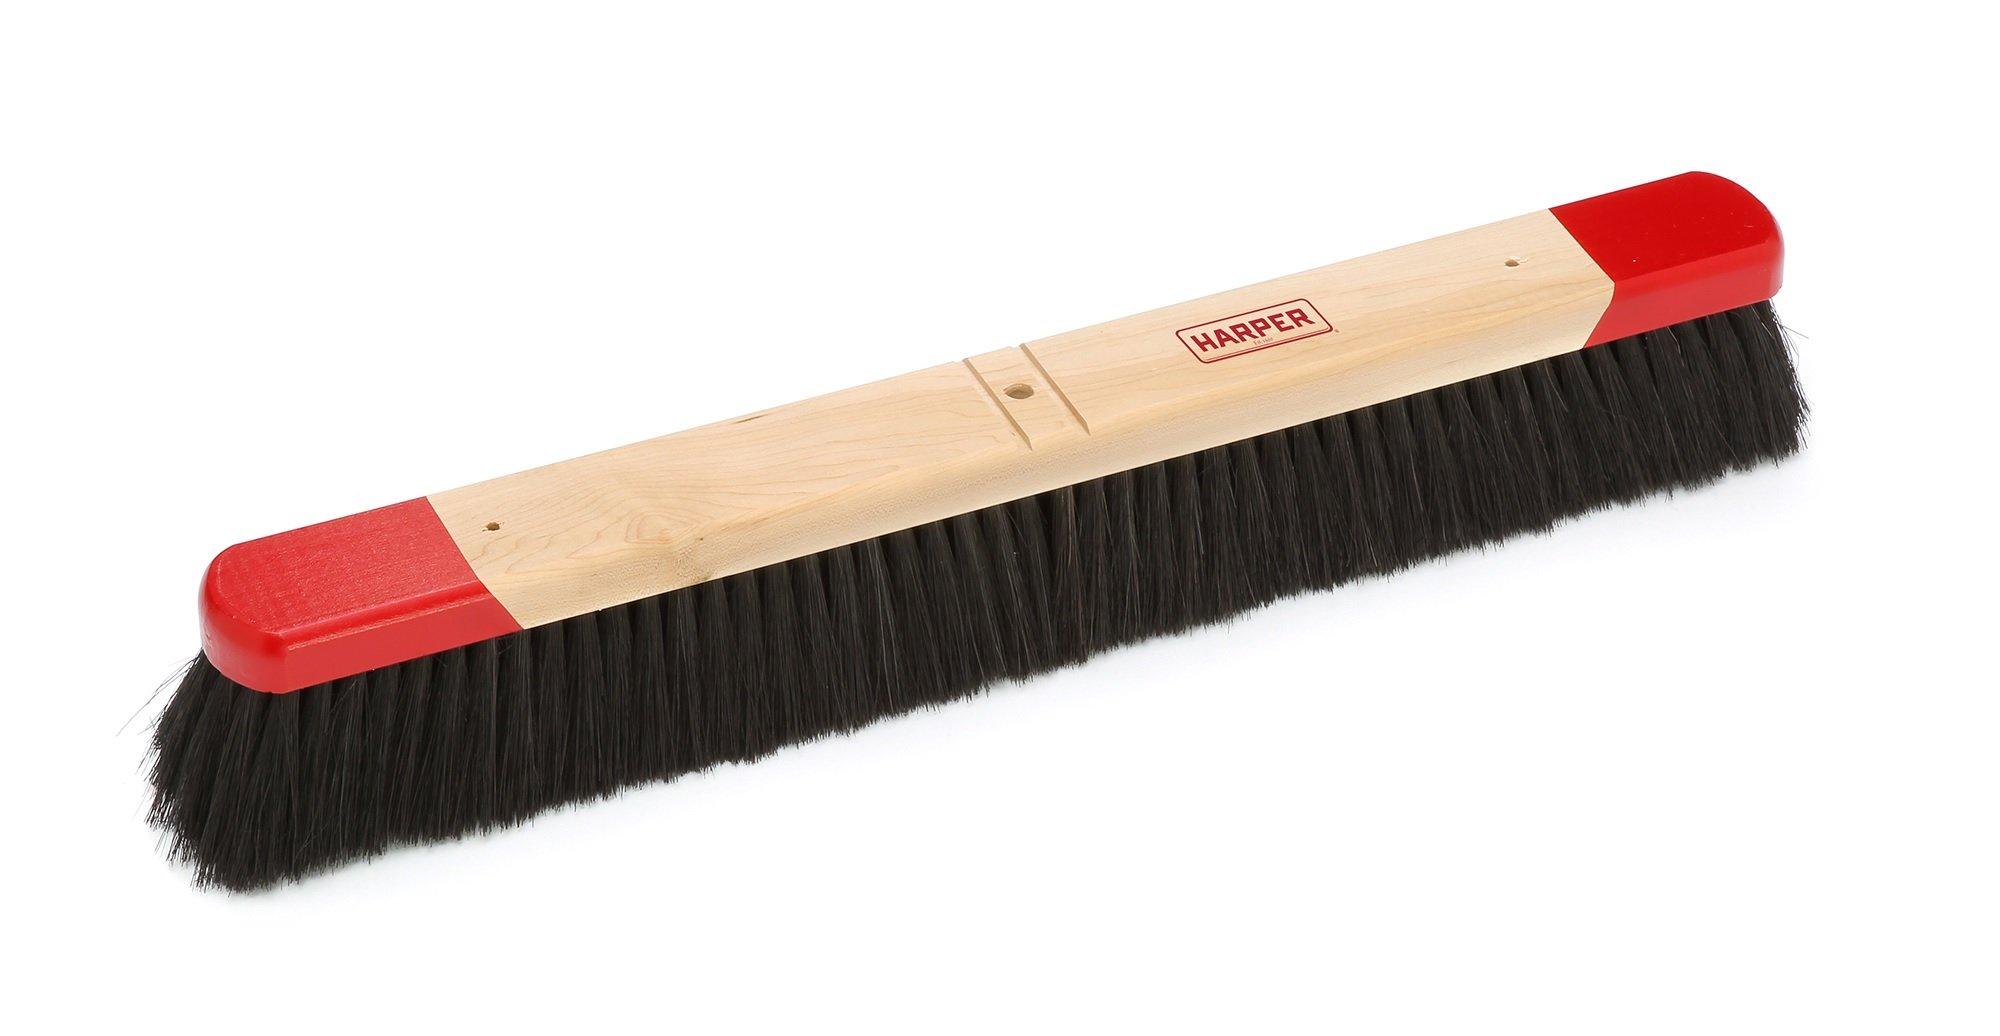 Harper Brush 542412 Broom Head, Tampico/Wire Fiber, All Purpose, Semi Rough Surface, Maple, 24'' (Pack of 6)